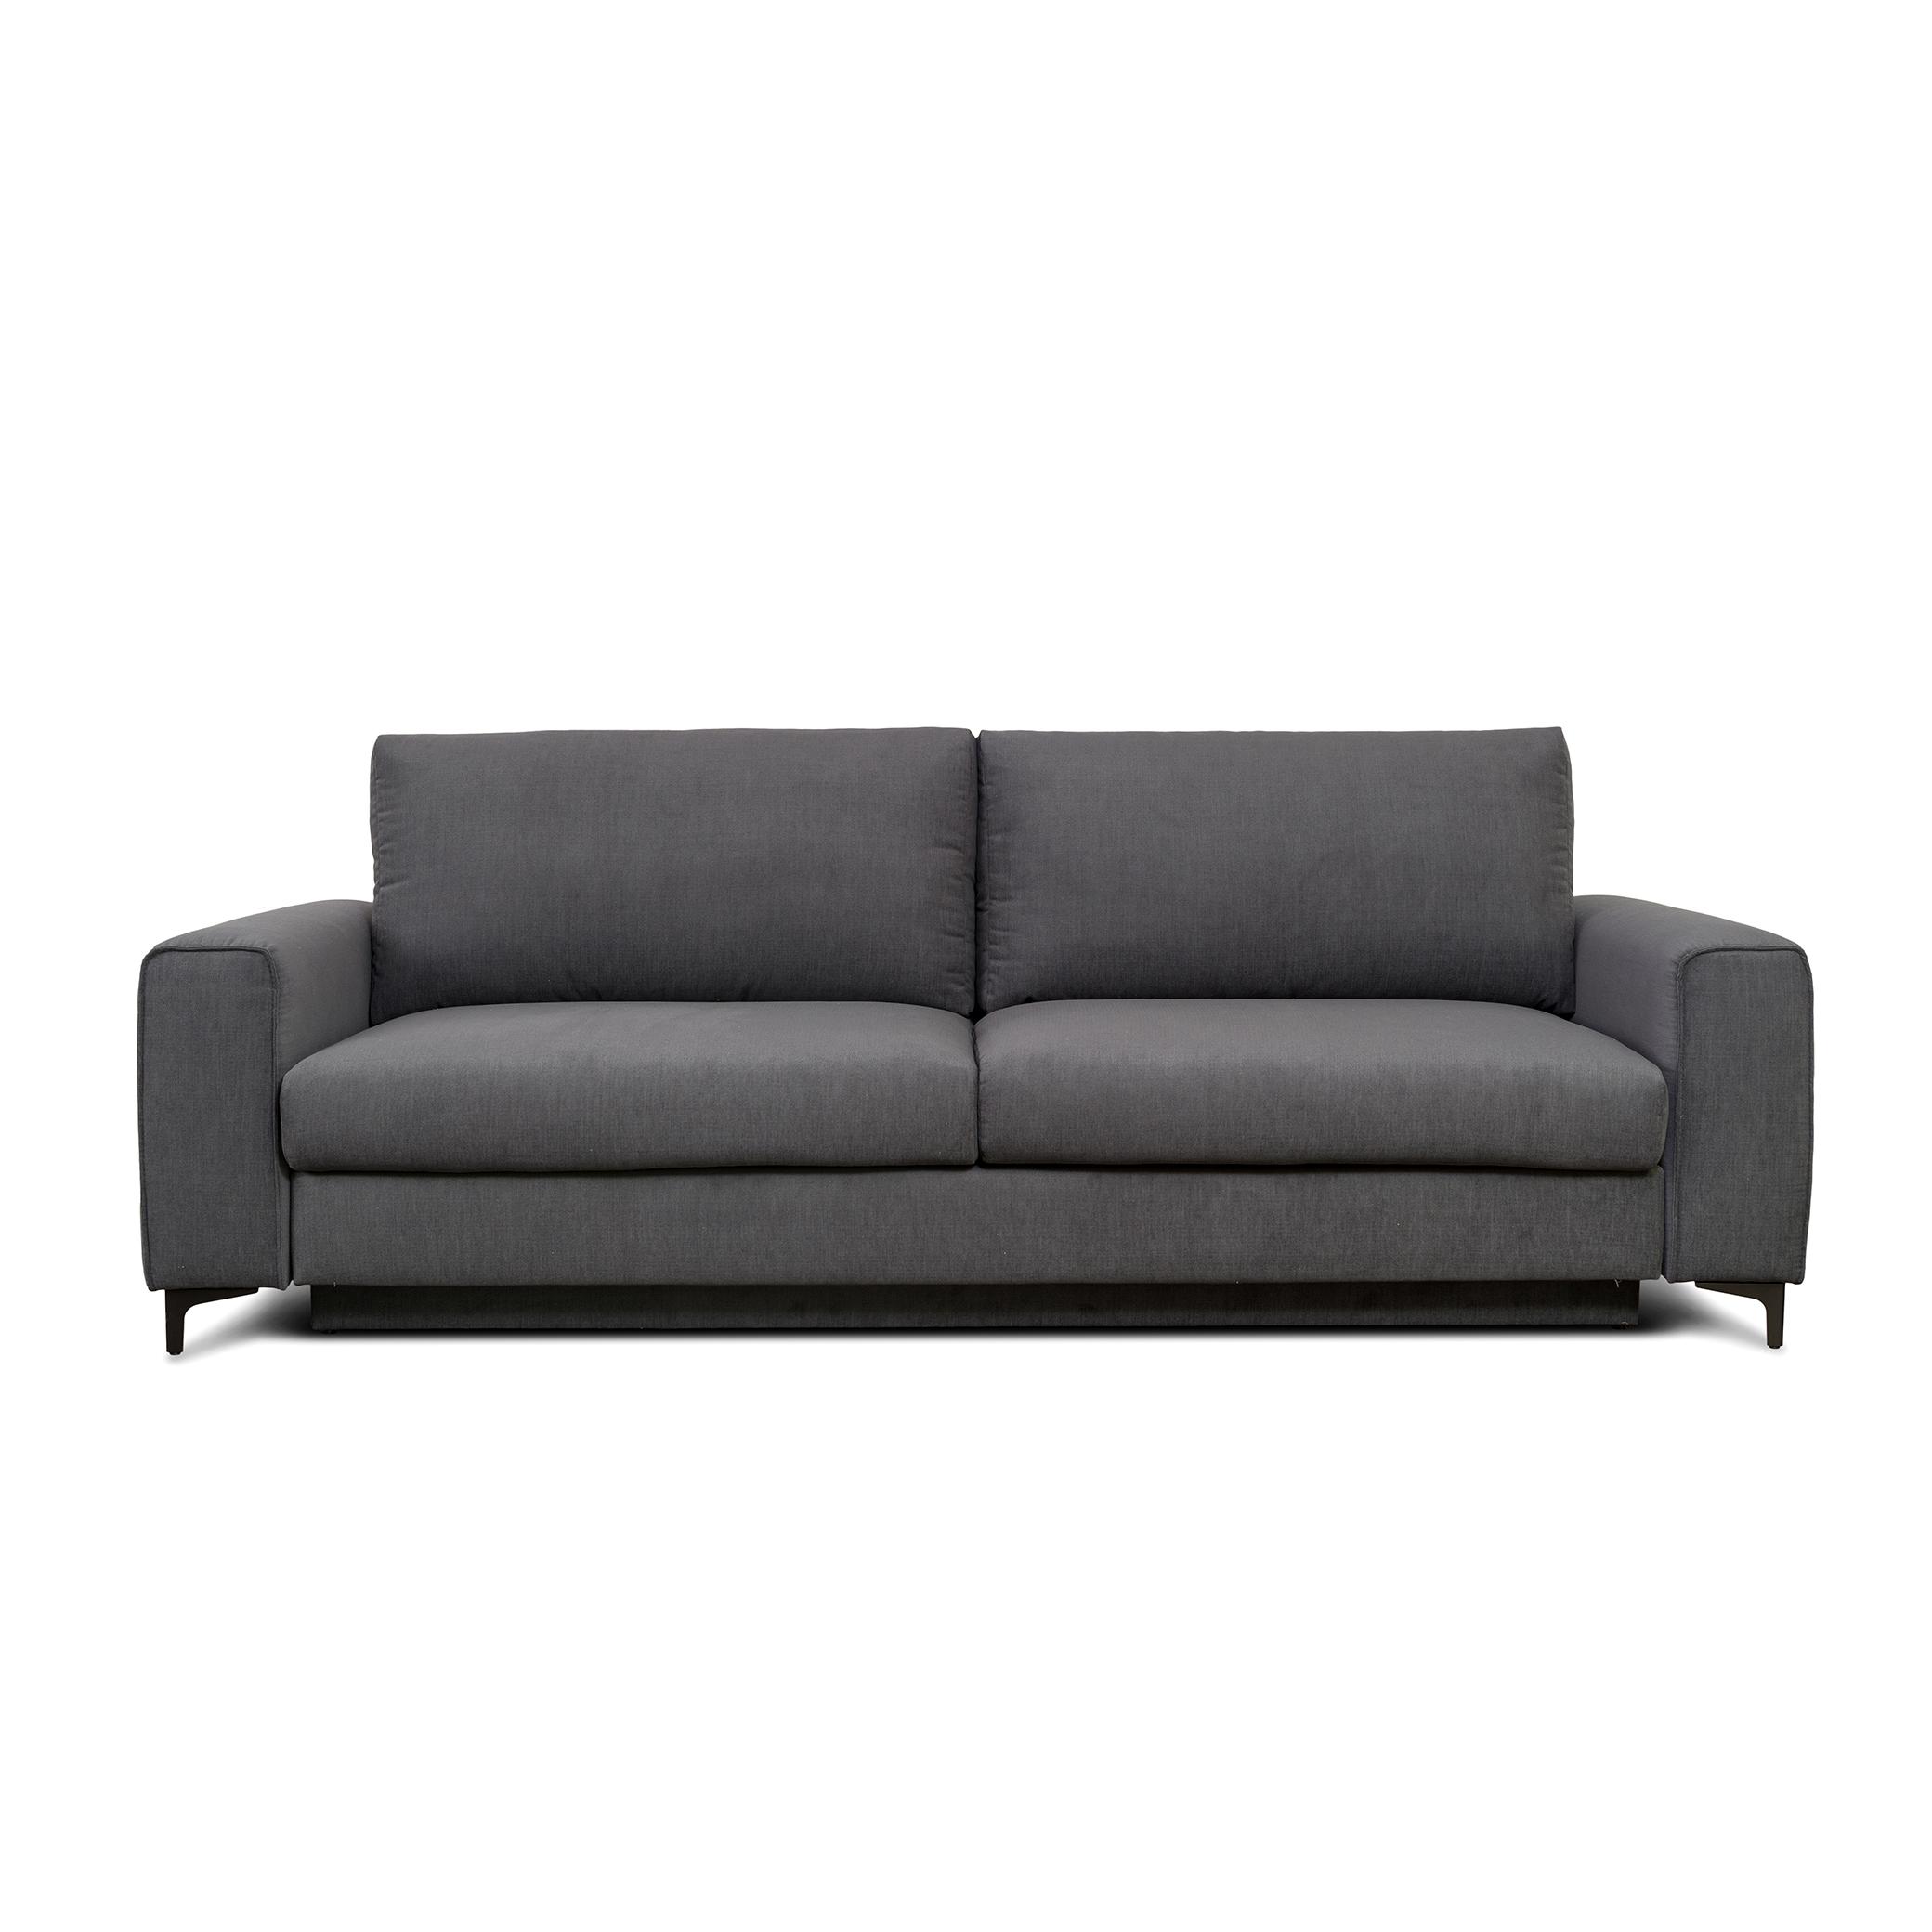 MOON Sofa 3 osobowa – Boki M  loading='lazy'